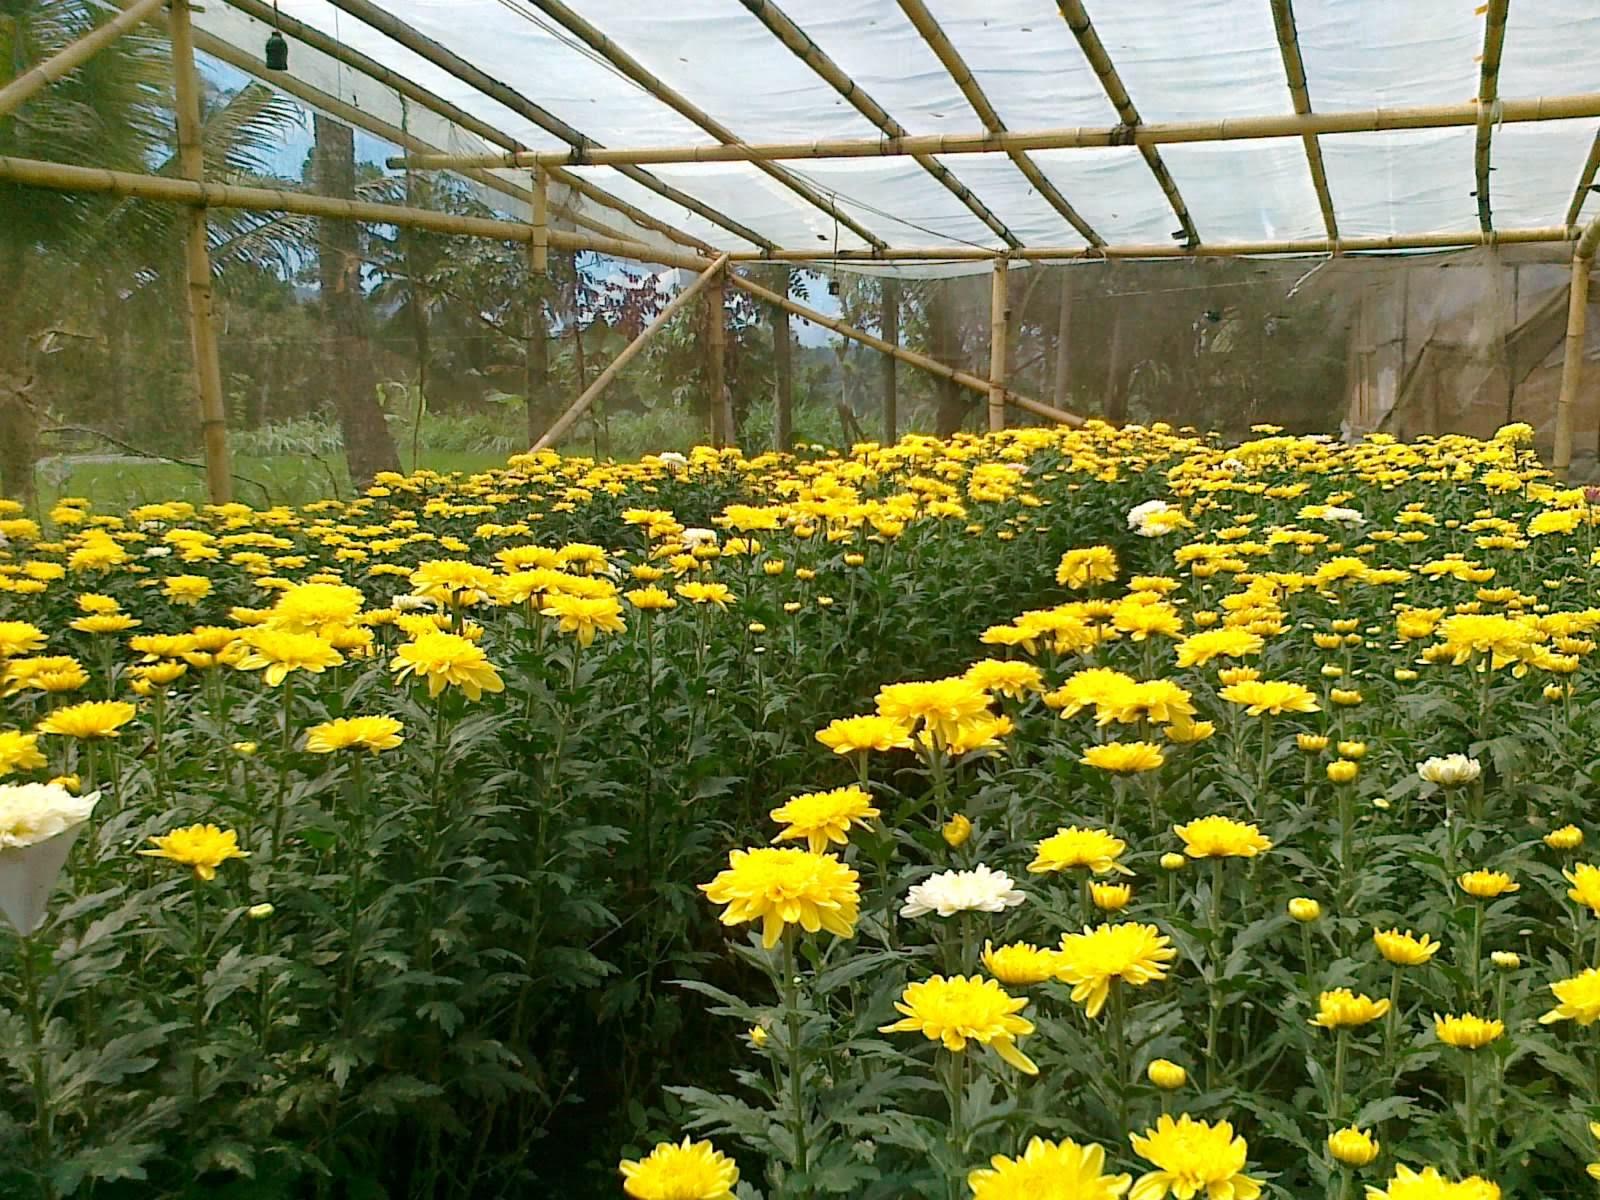 bunga krisan | bunga seruni | budidaya | jual bunga tanaman hias